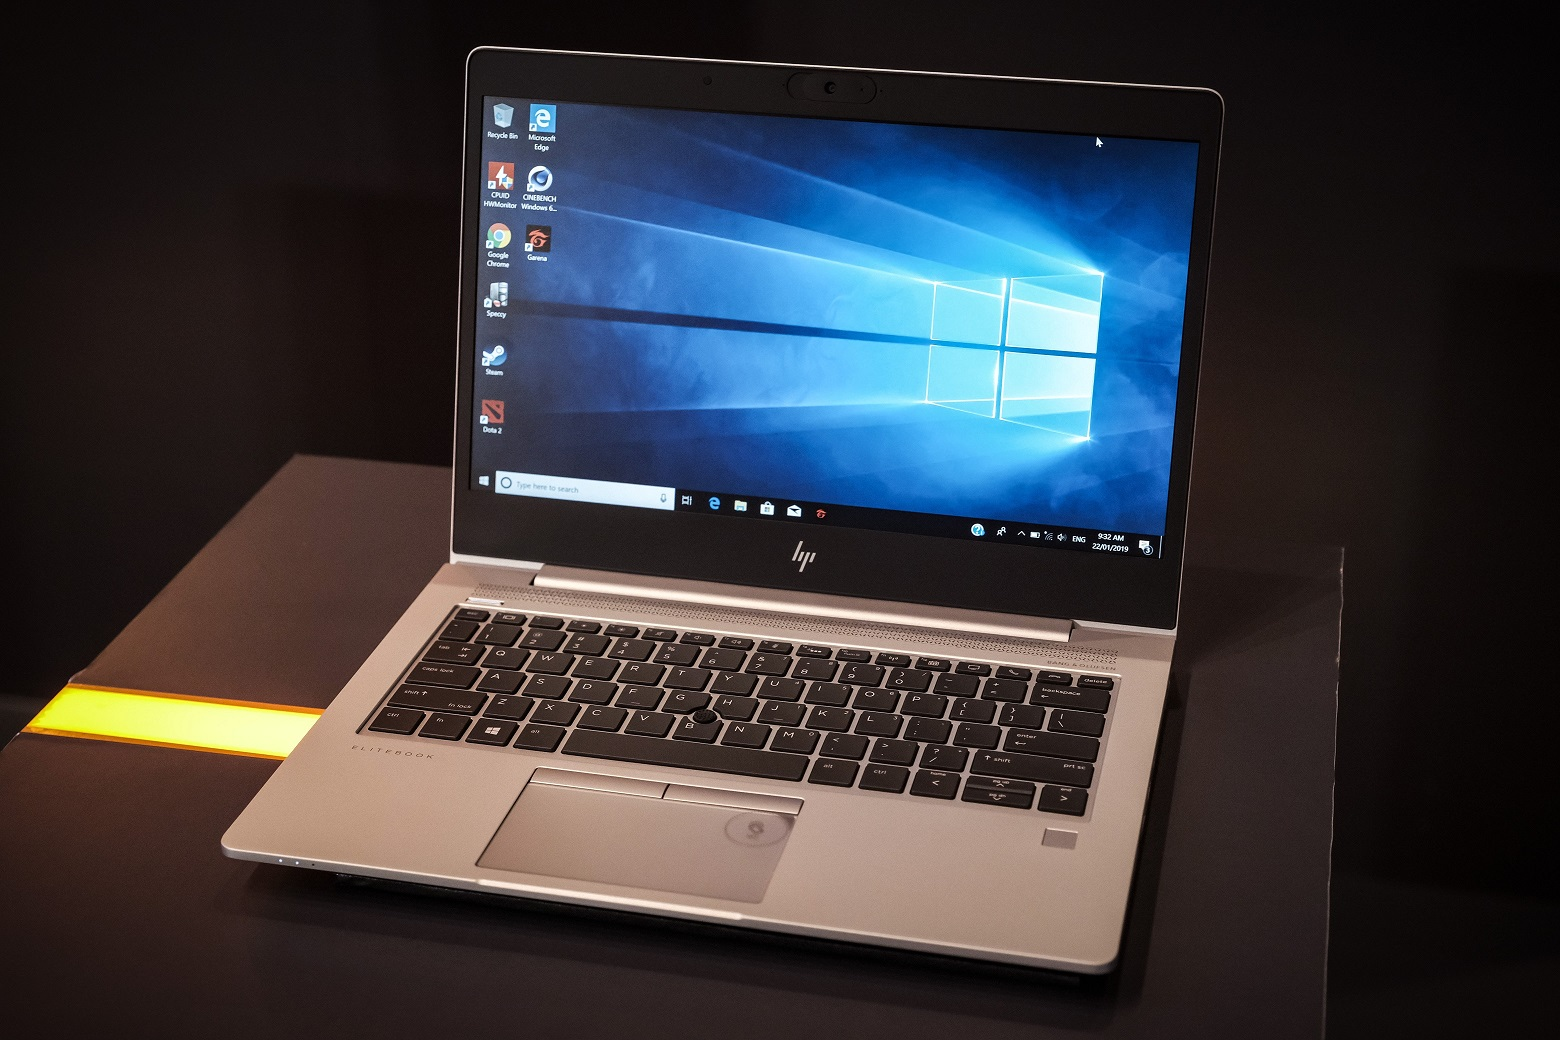 Windows10 1909 file explorer bug fix coming soon